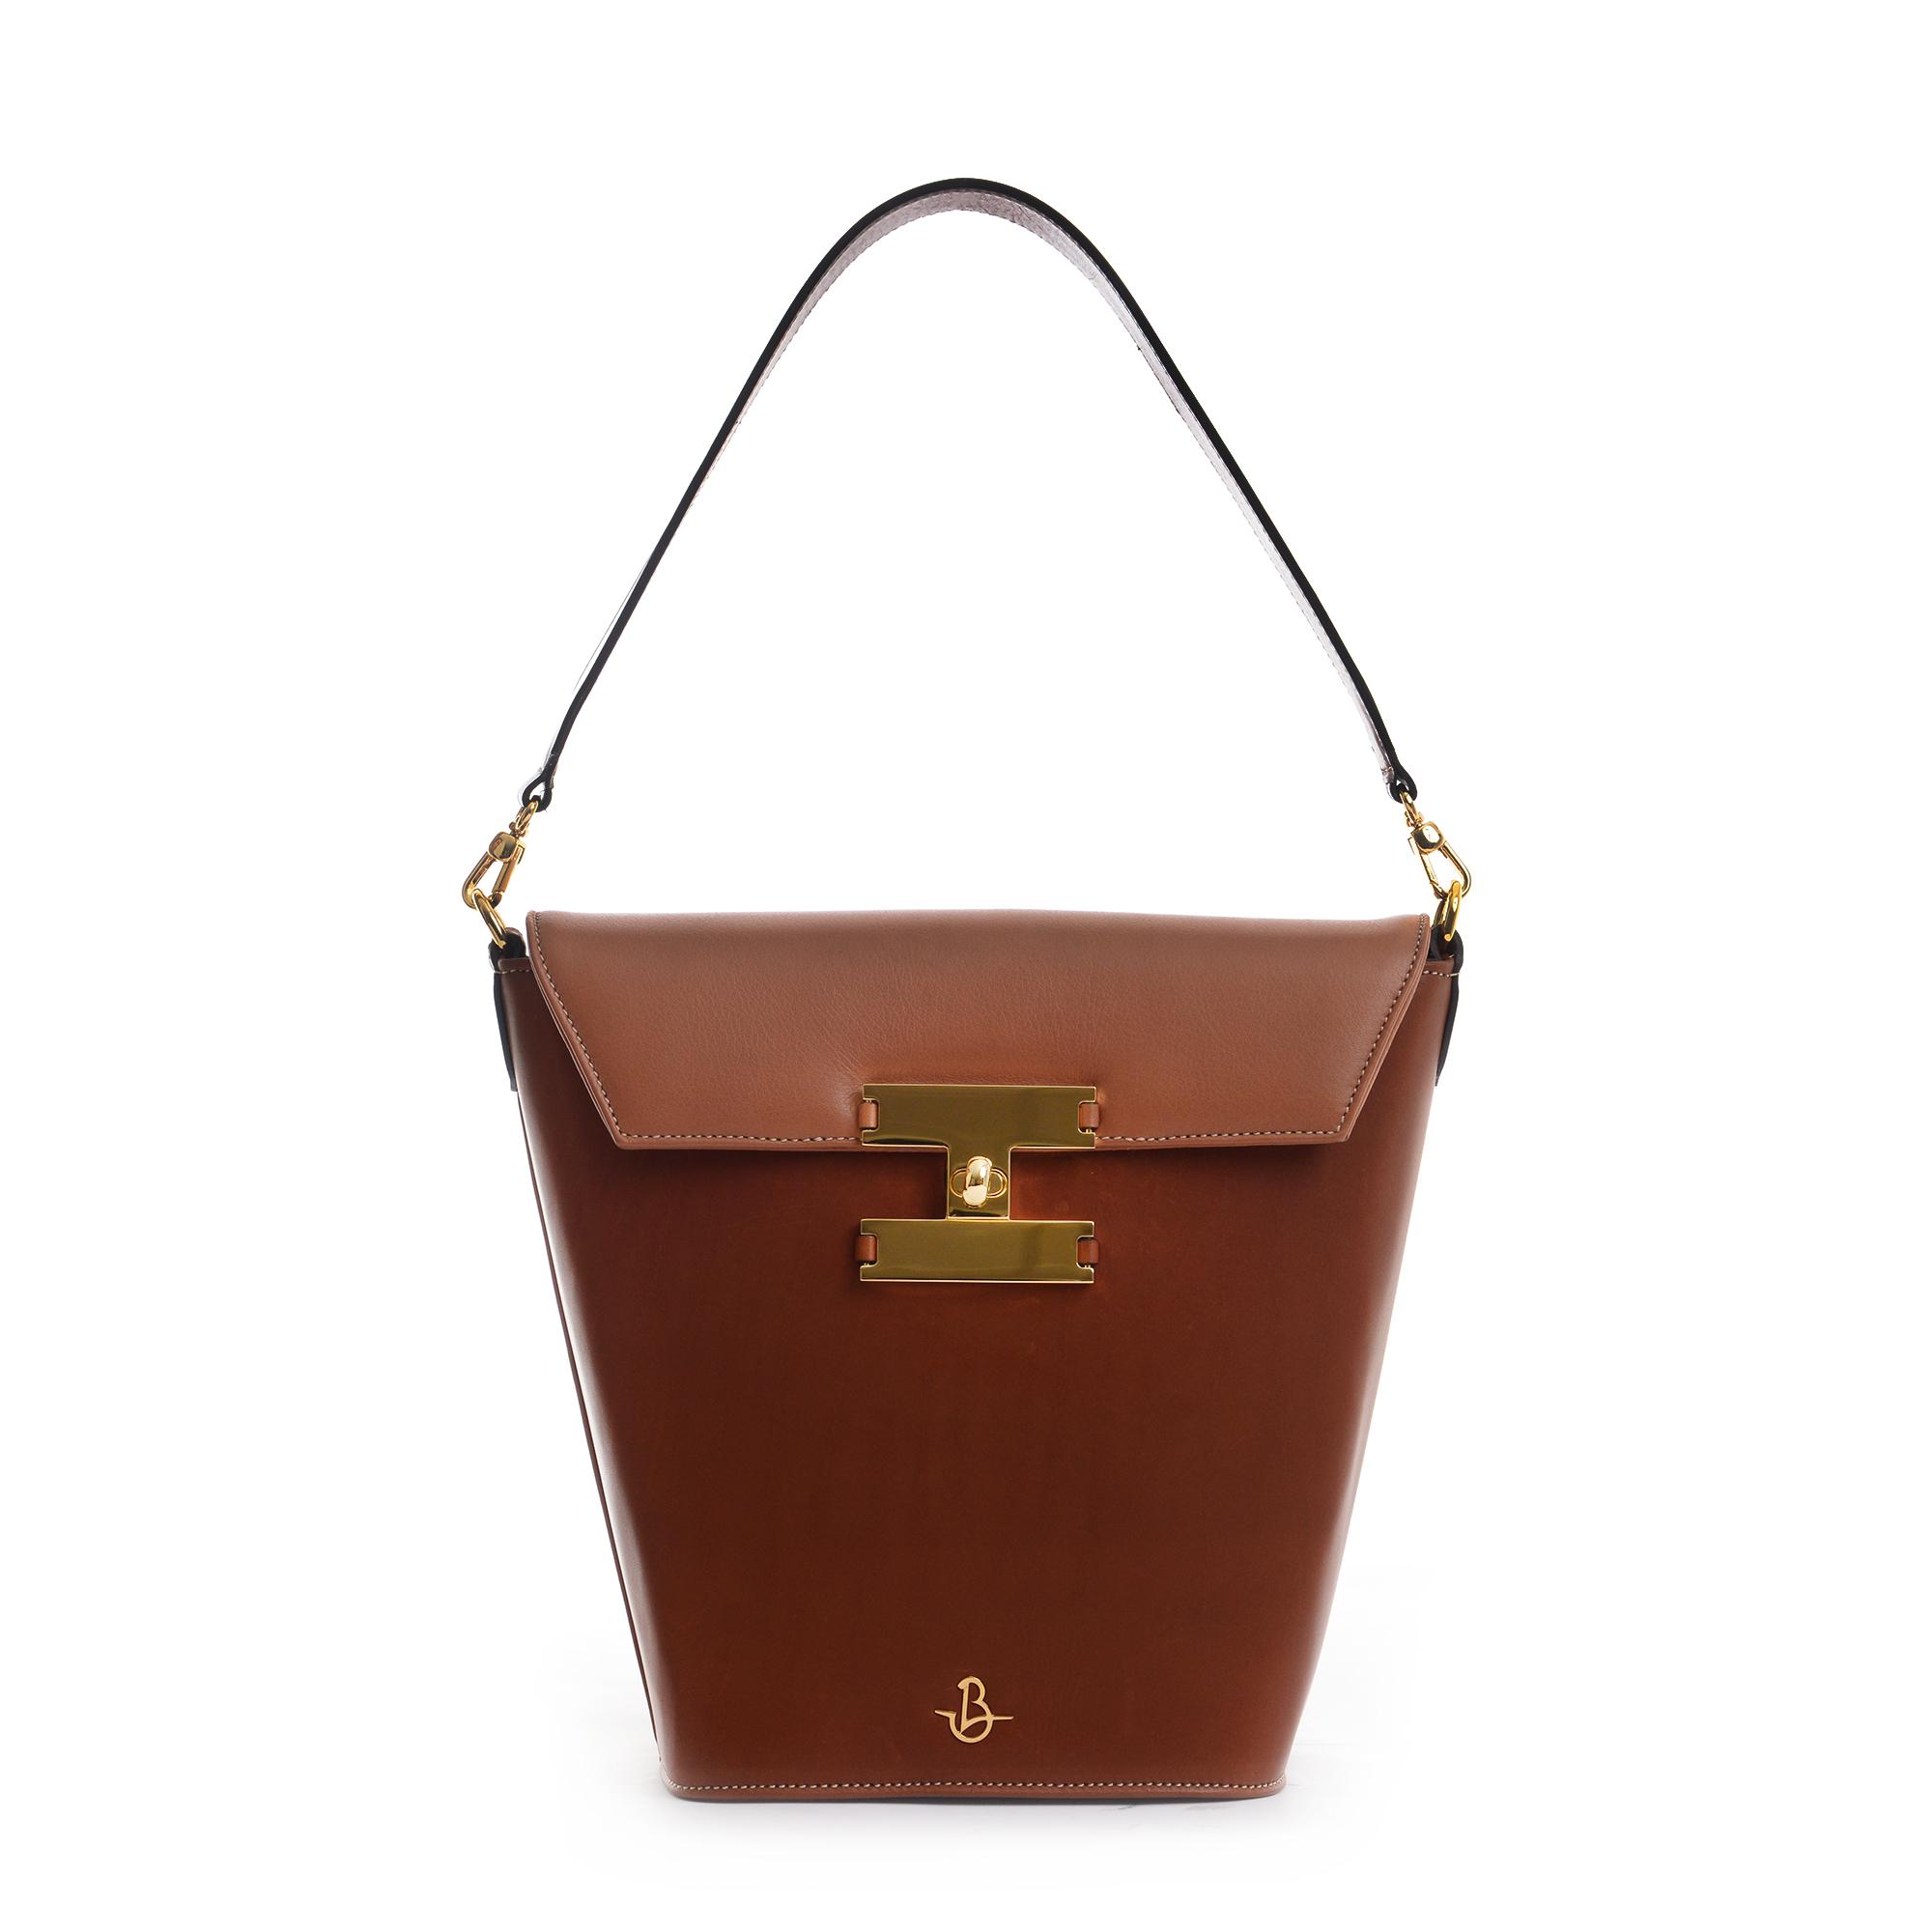 Audrey 231 - Woman Leather handbag tan